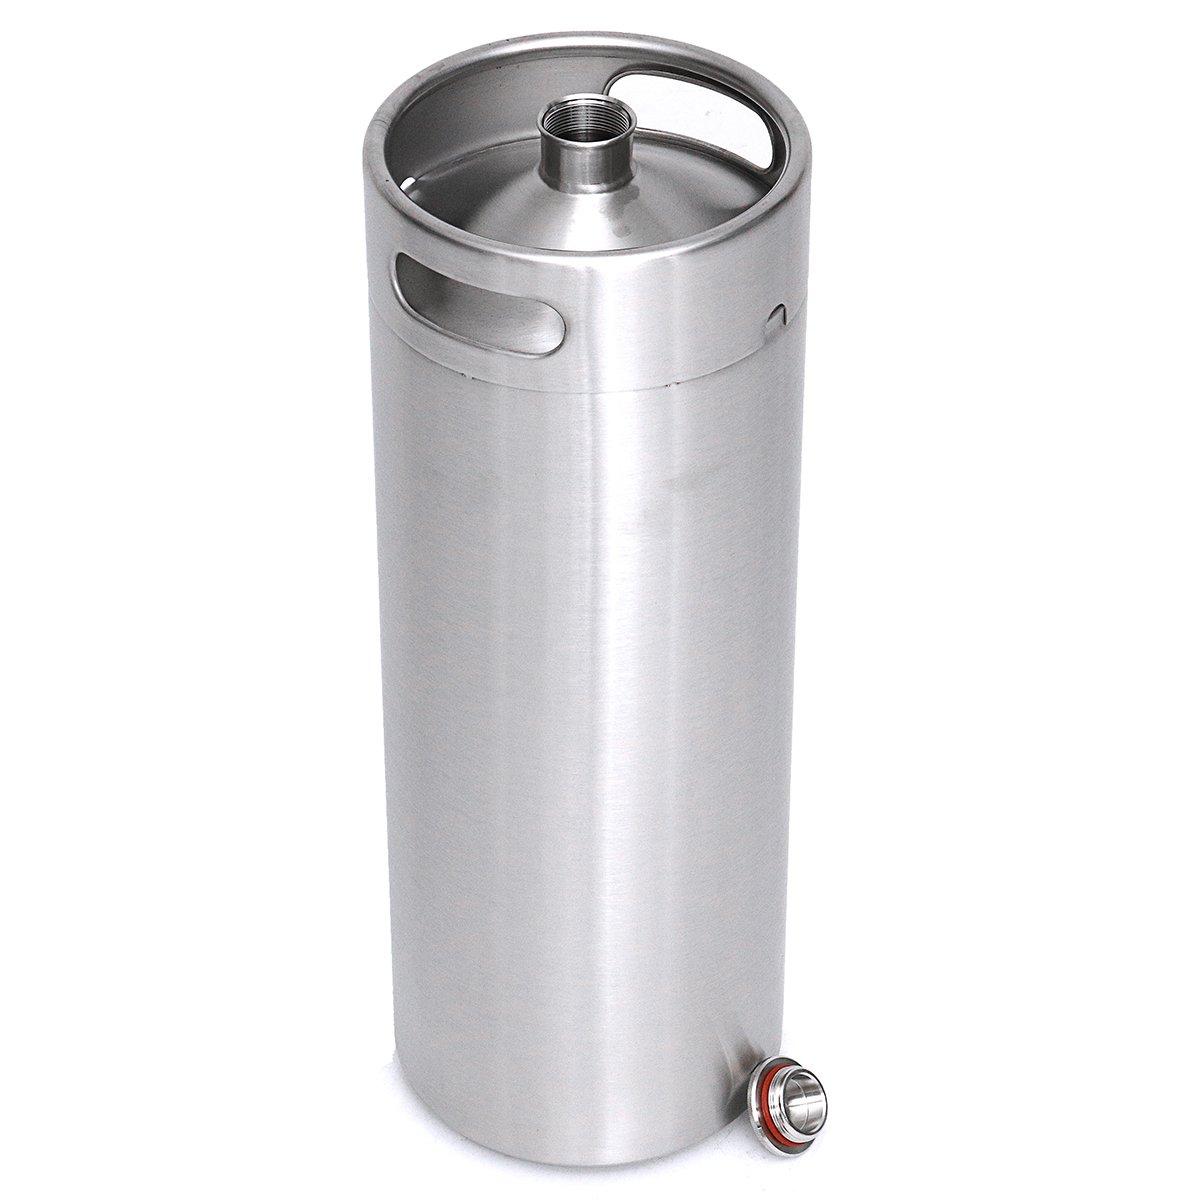 Stainless Steel Brew Barrel, SENREAL 10L Stainless Steel Cast Growler Barrel Beer Wine Making Tools Accessories by SENREAL (Image #4)